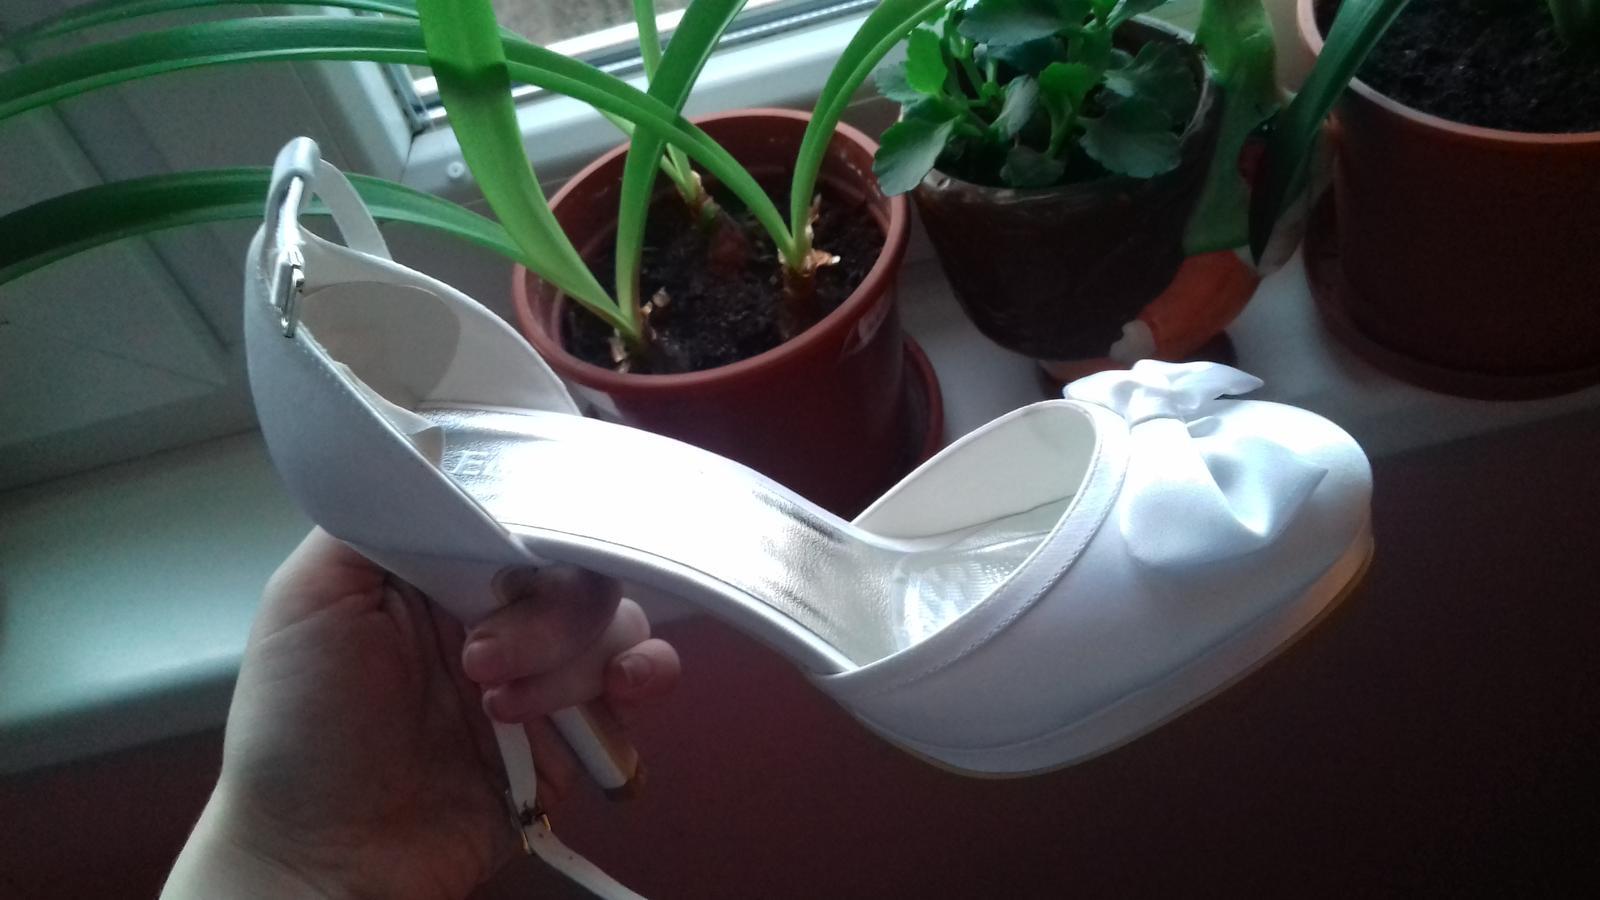 Svadobné biele topánky - Obrázok č. 3